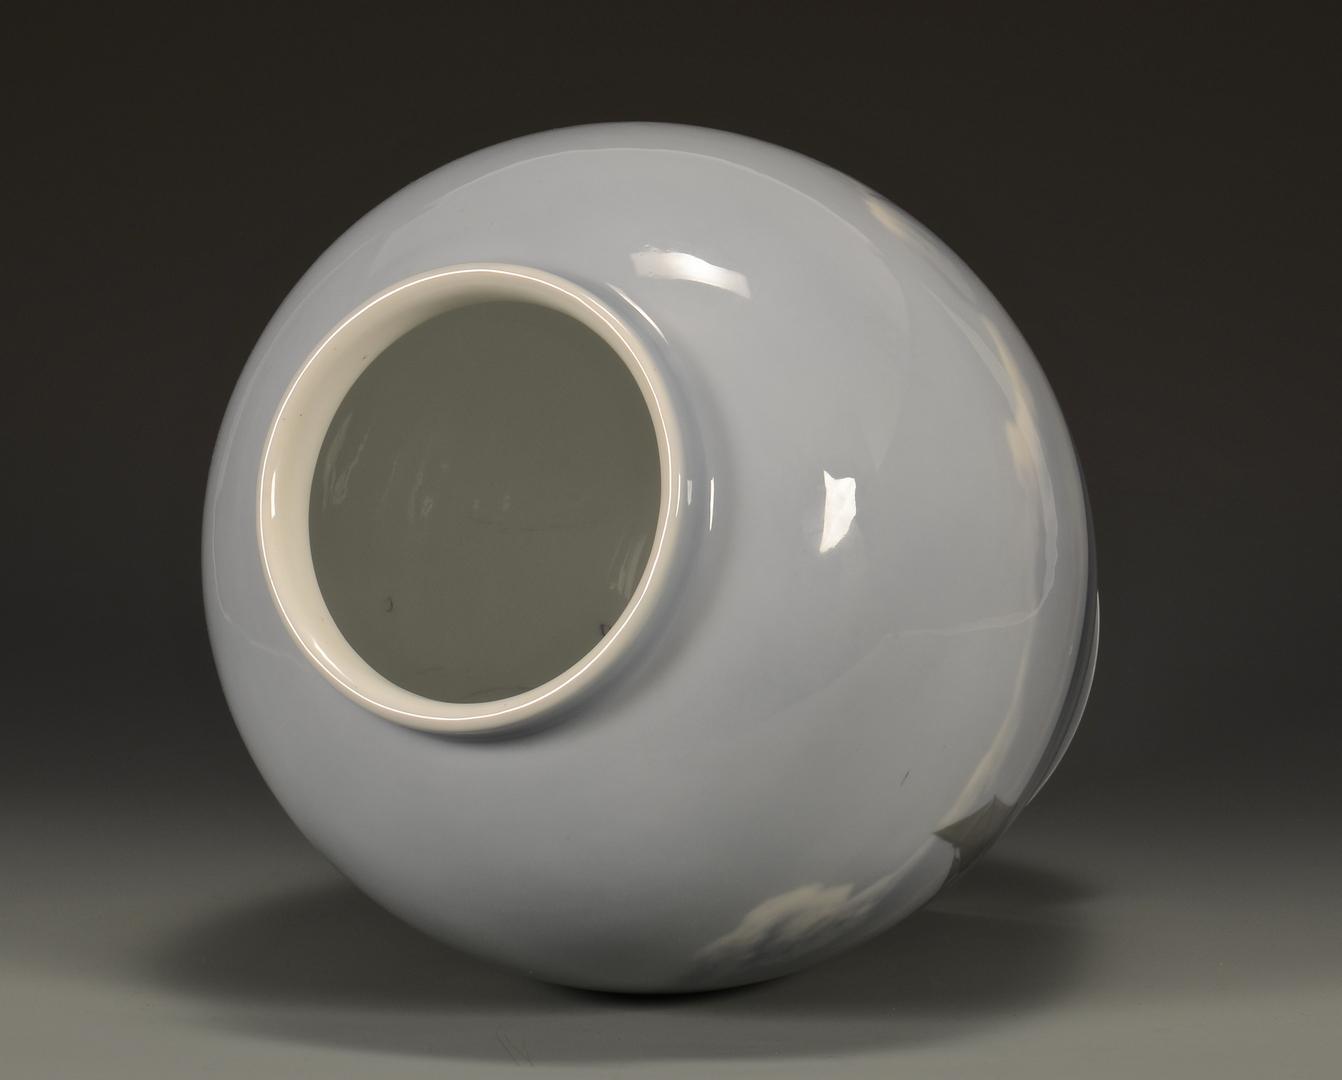 Lot 489: Royal Copenhagen Porcelain Vase